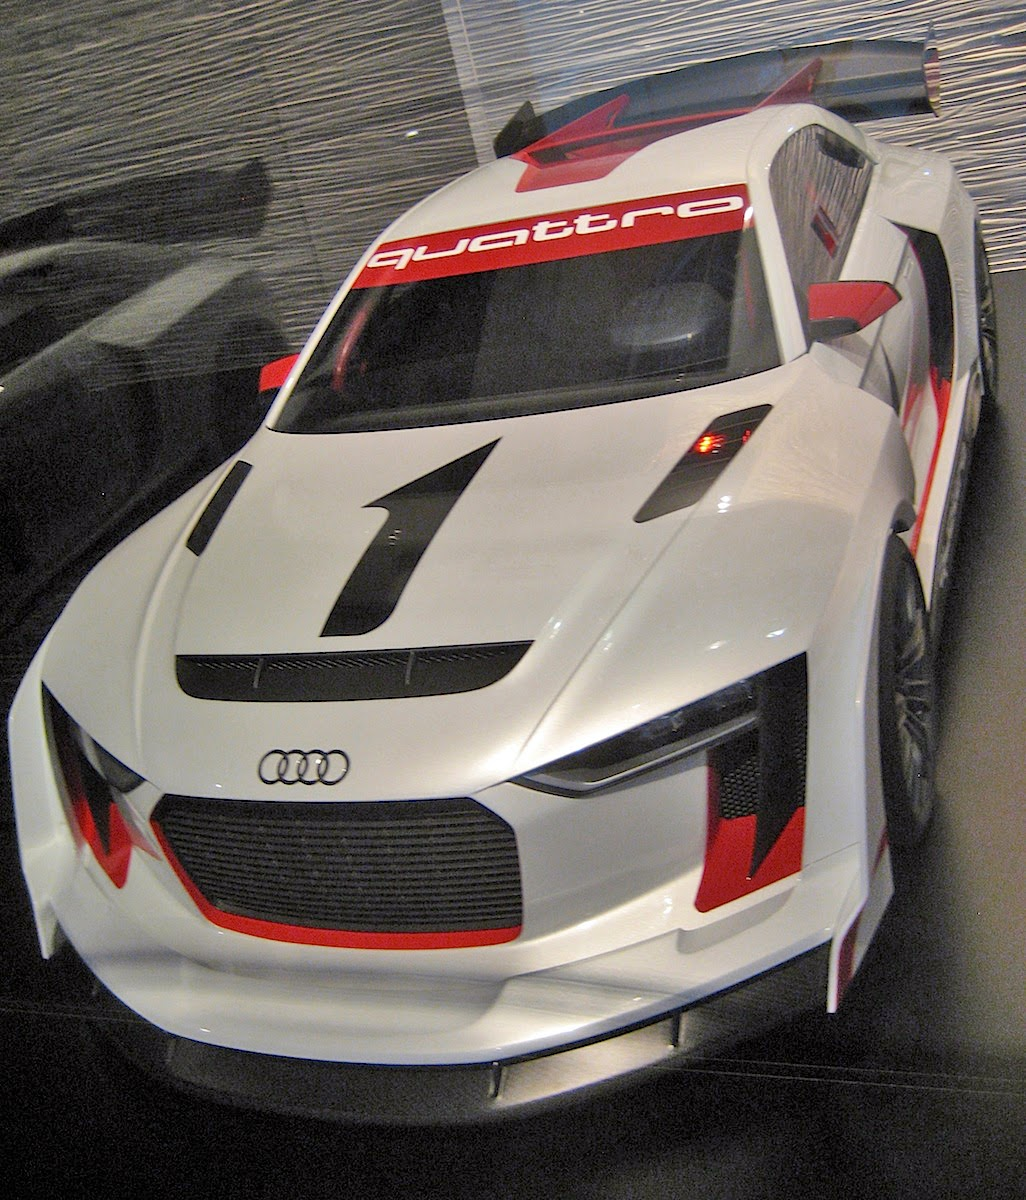 audi quattro concept rally car design model. Black Bedroom Furniture Sets. Home Design Ideas